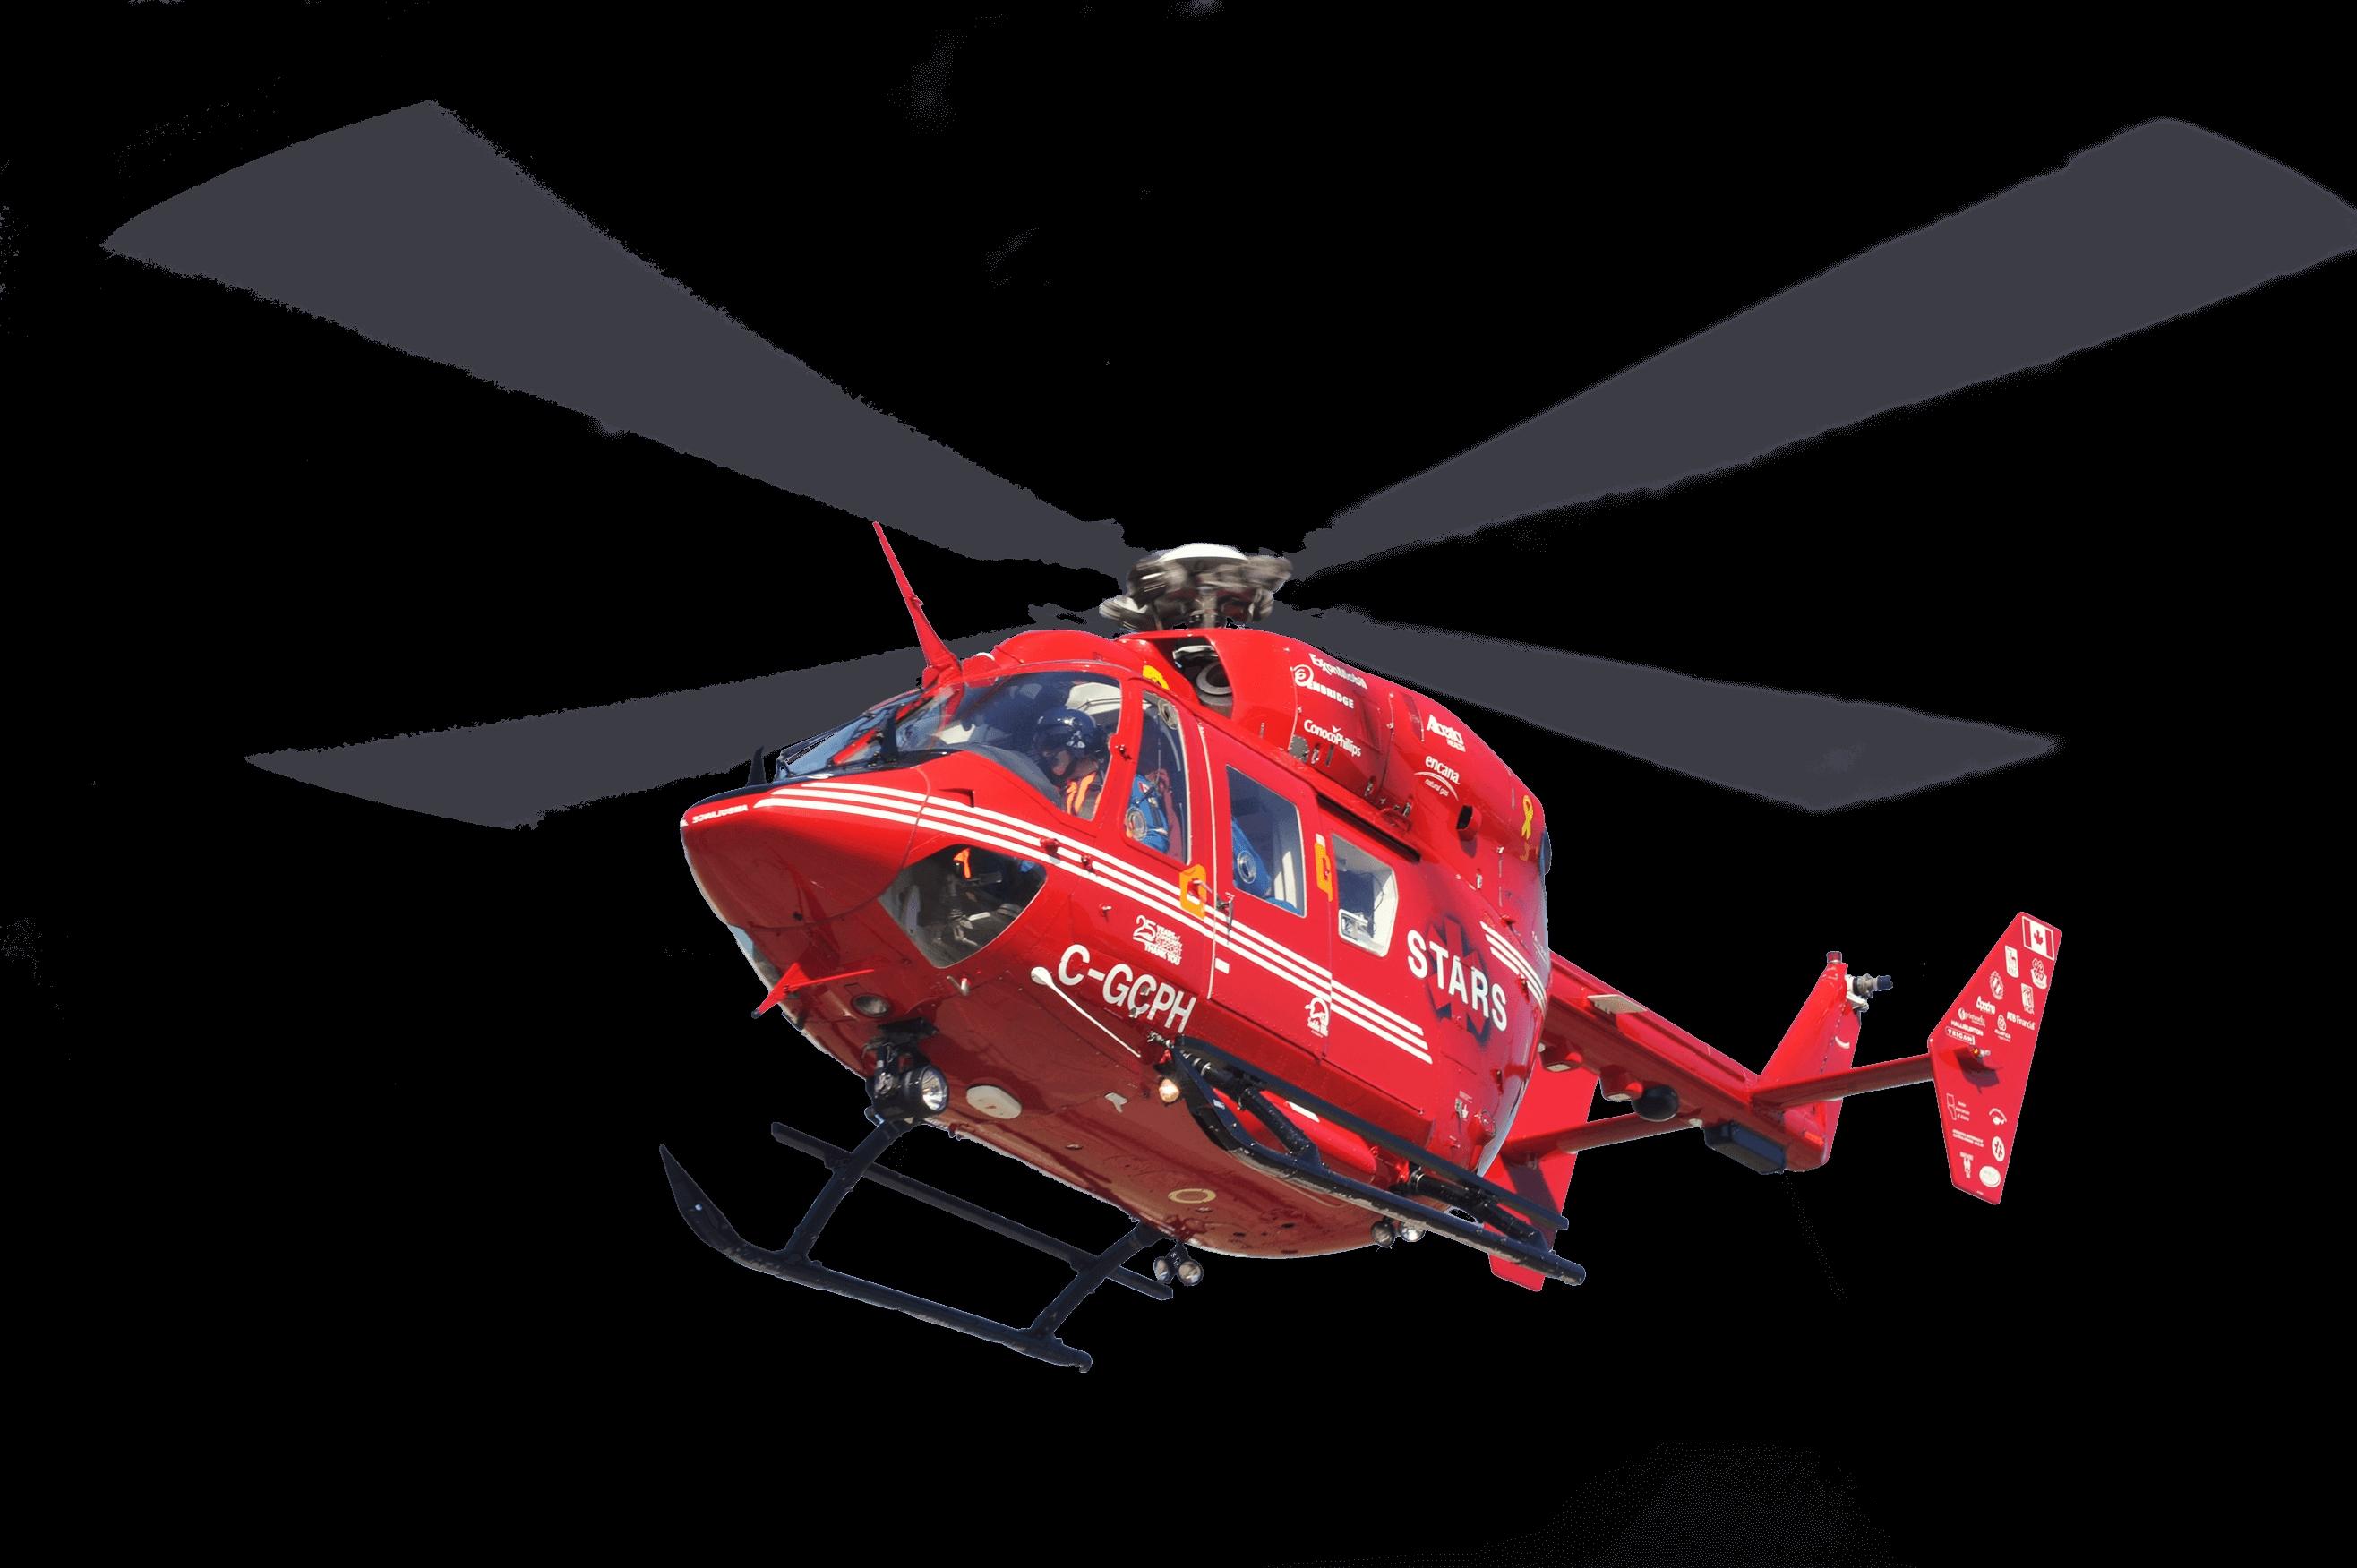 Png Aircraft Register New Stars Air Ambulance.